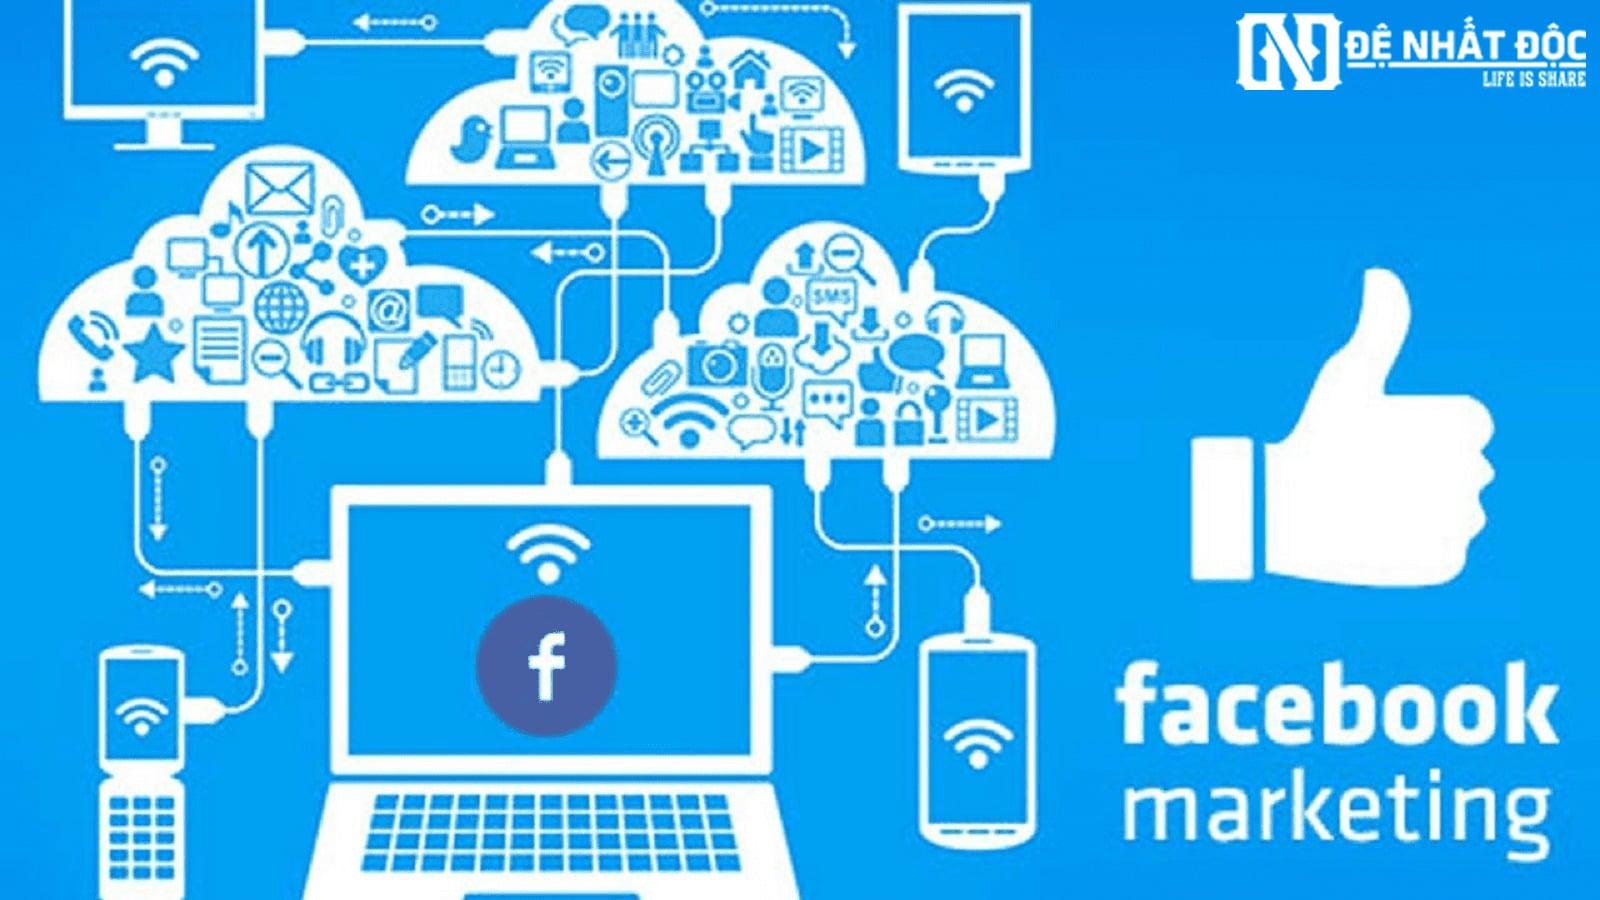 facebook-marketing-la-gi-4.